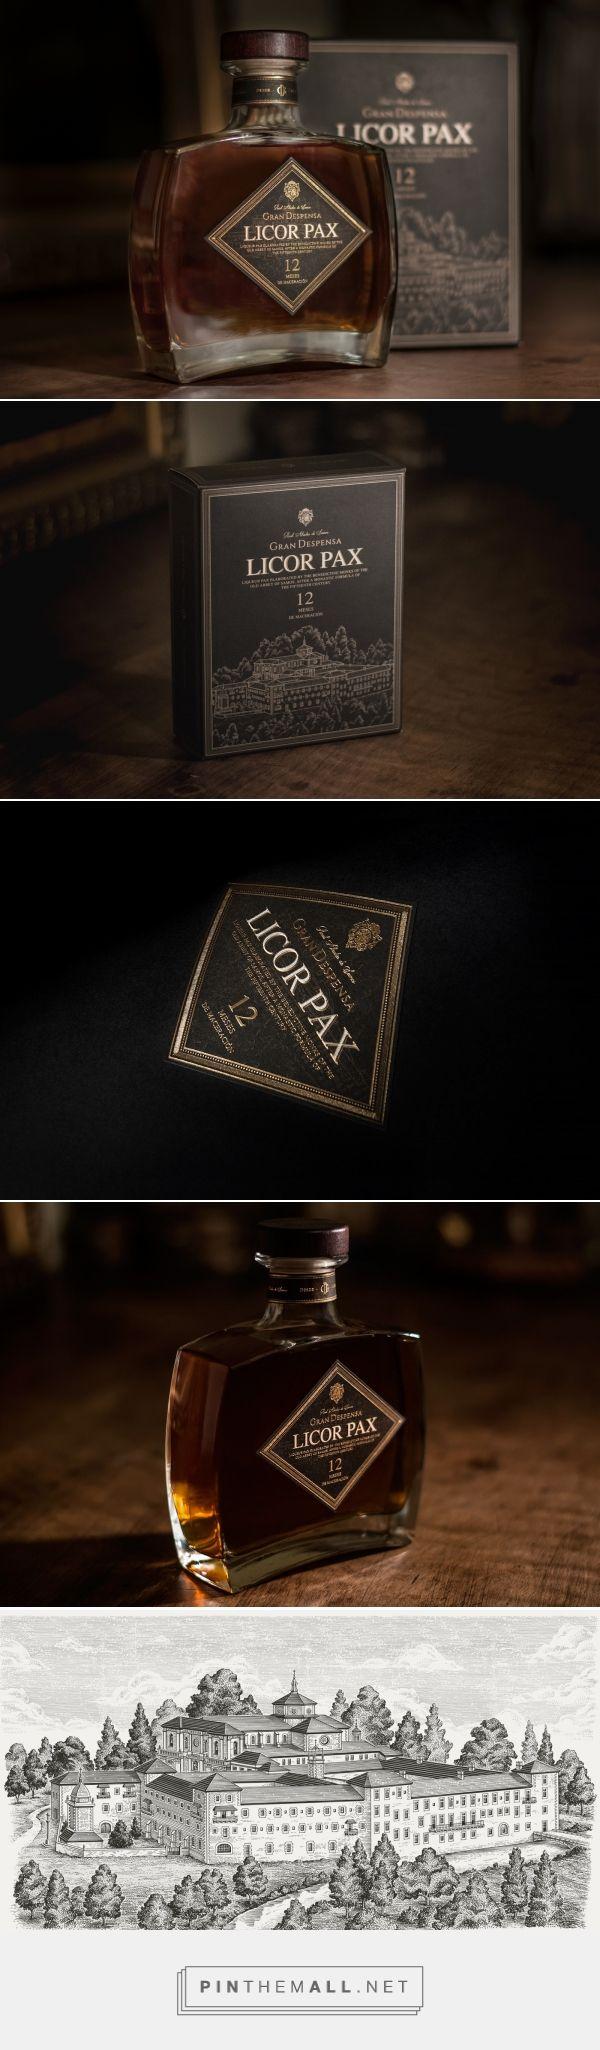 Licor PAX packaging design by Dosdelugo Agencia Creativa - http://www.packagingoftheworld.com/2017/10/licor-pax.html